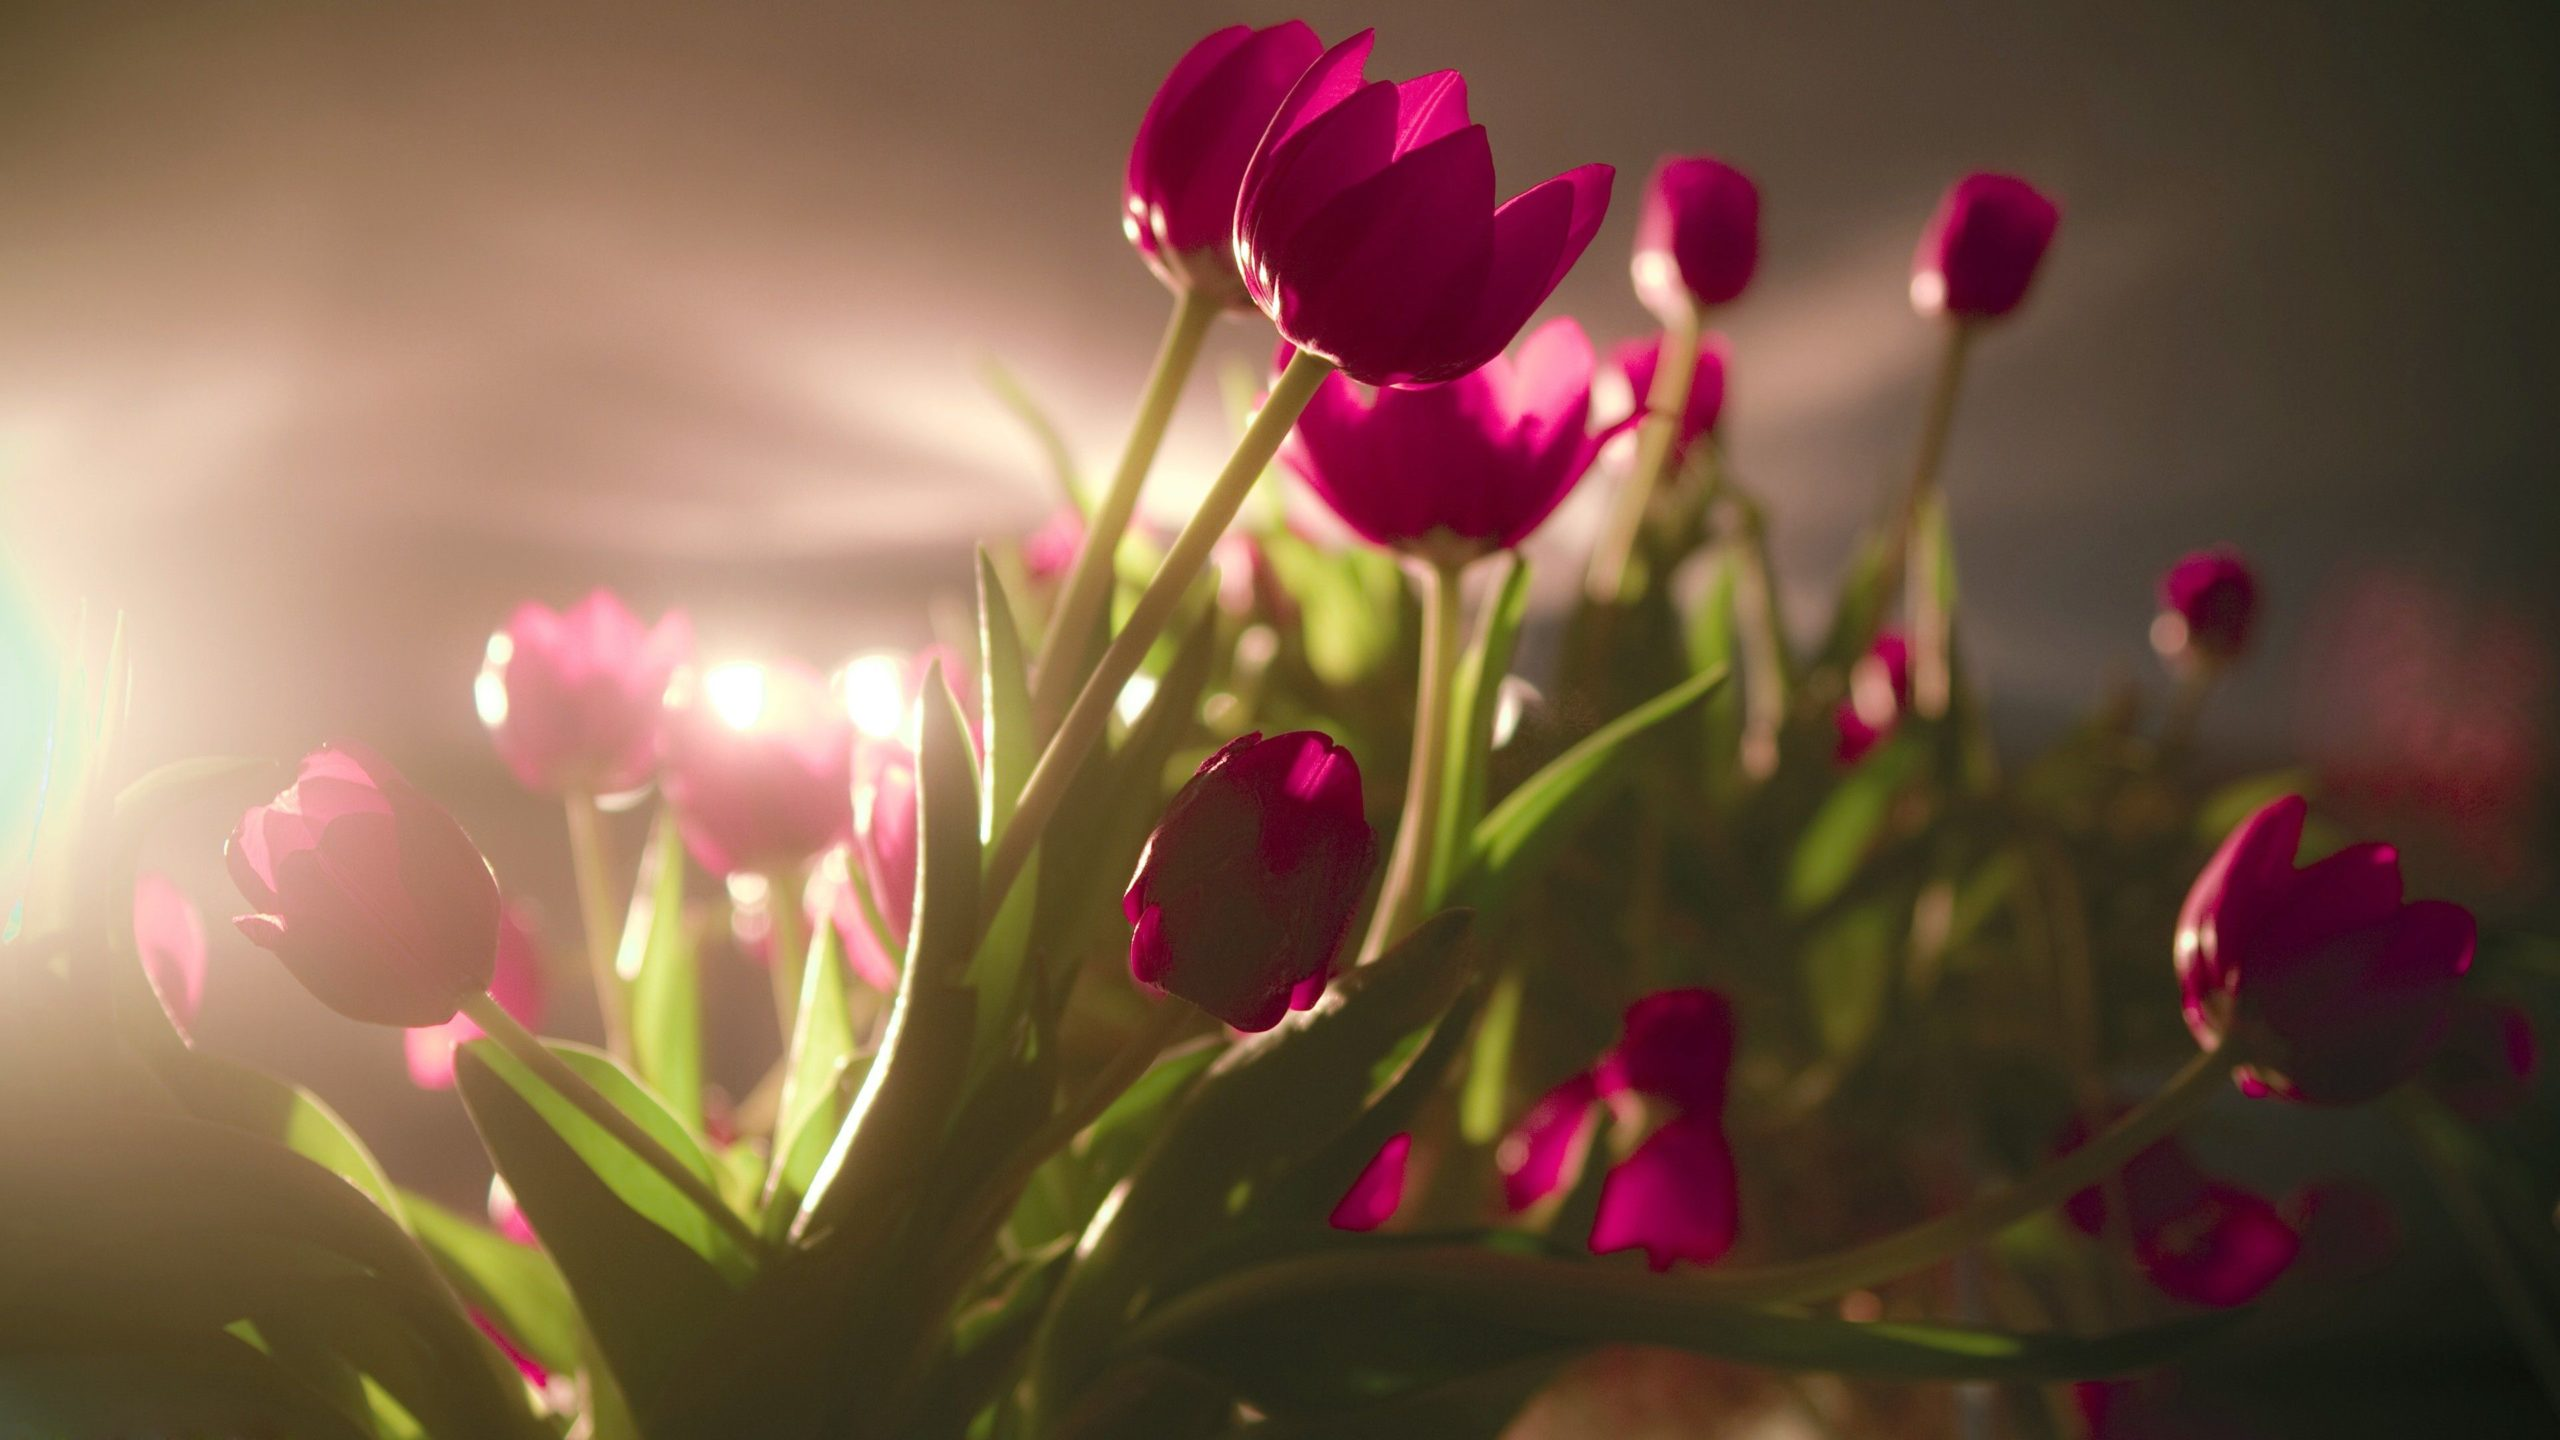 tulip background images free